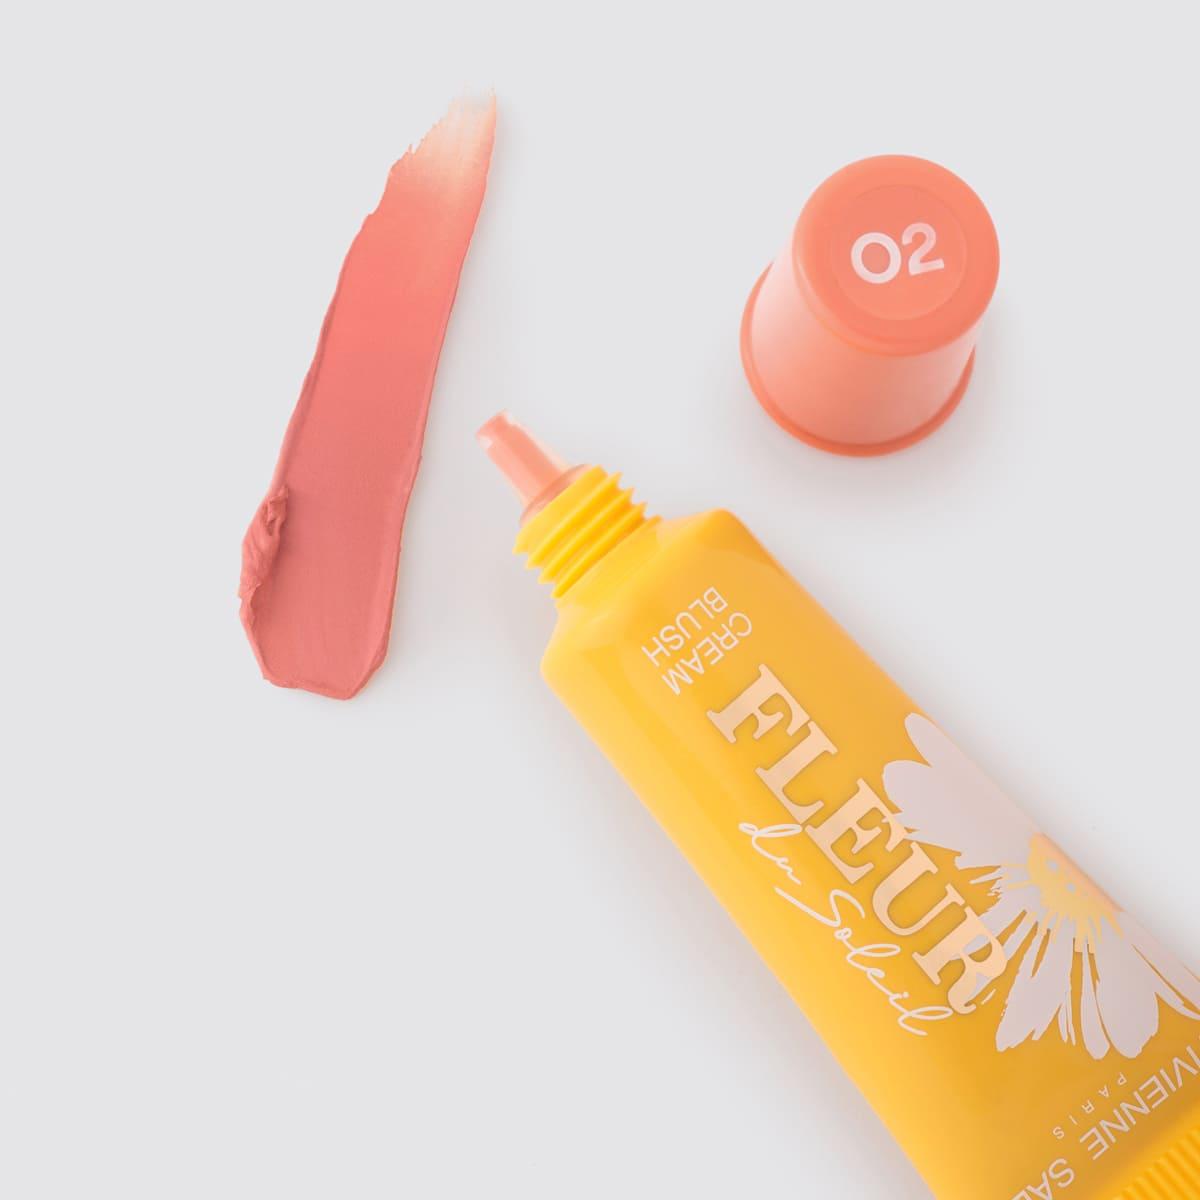 Vivienne Sabo - Cream Blush Fleur du Soleil 01 - 9 ML